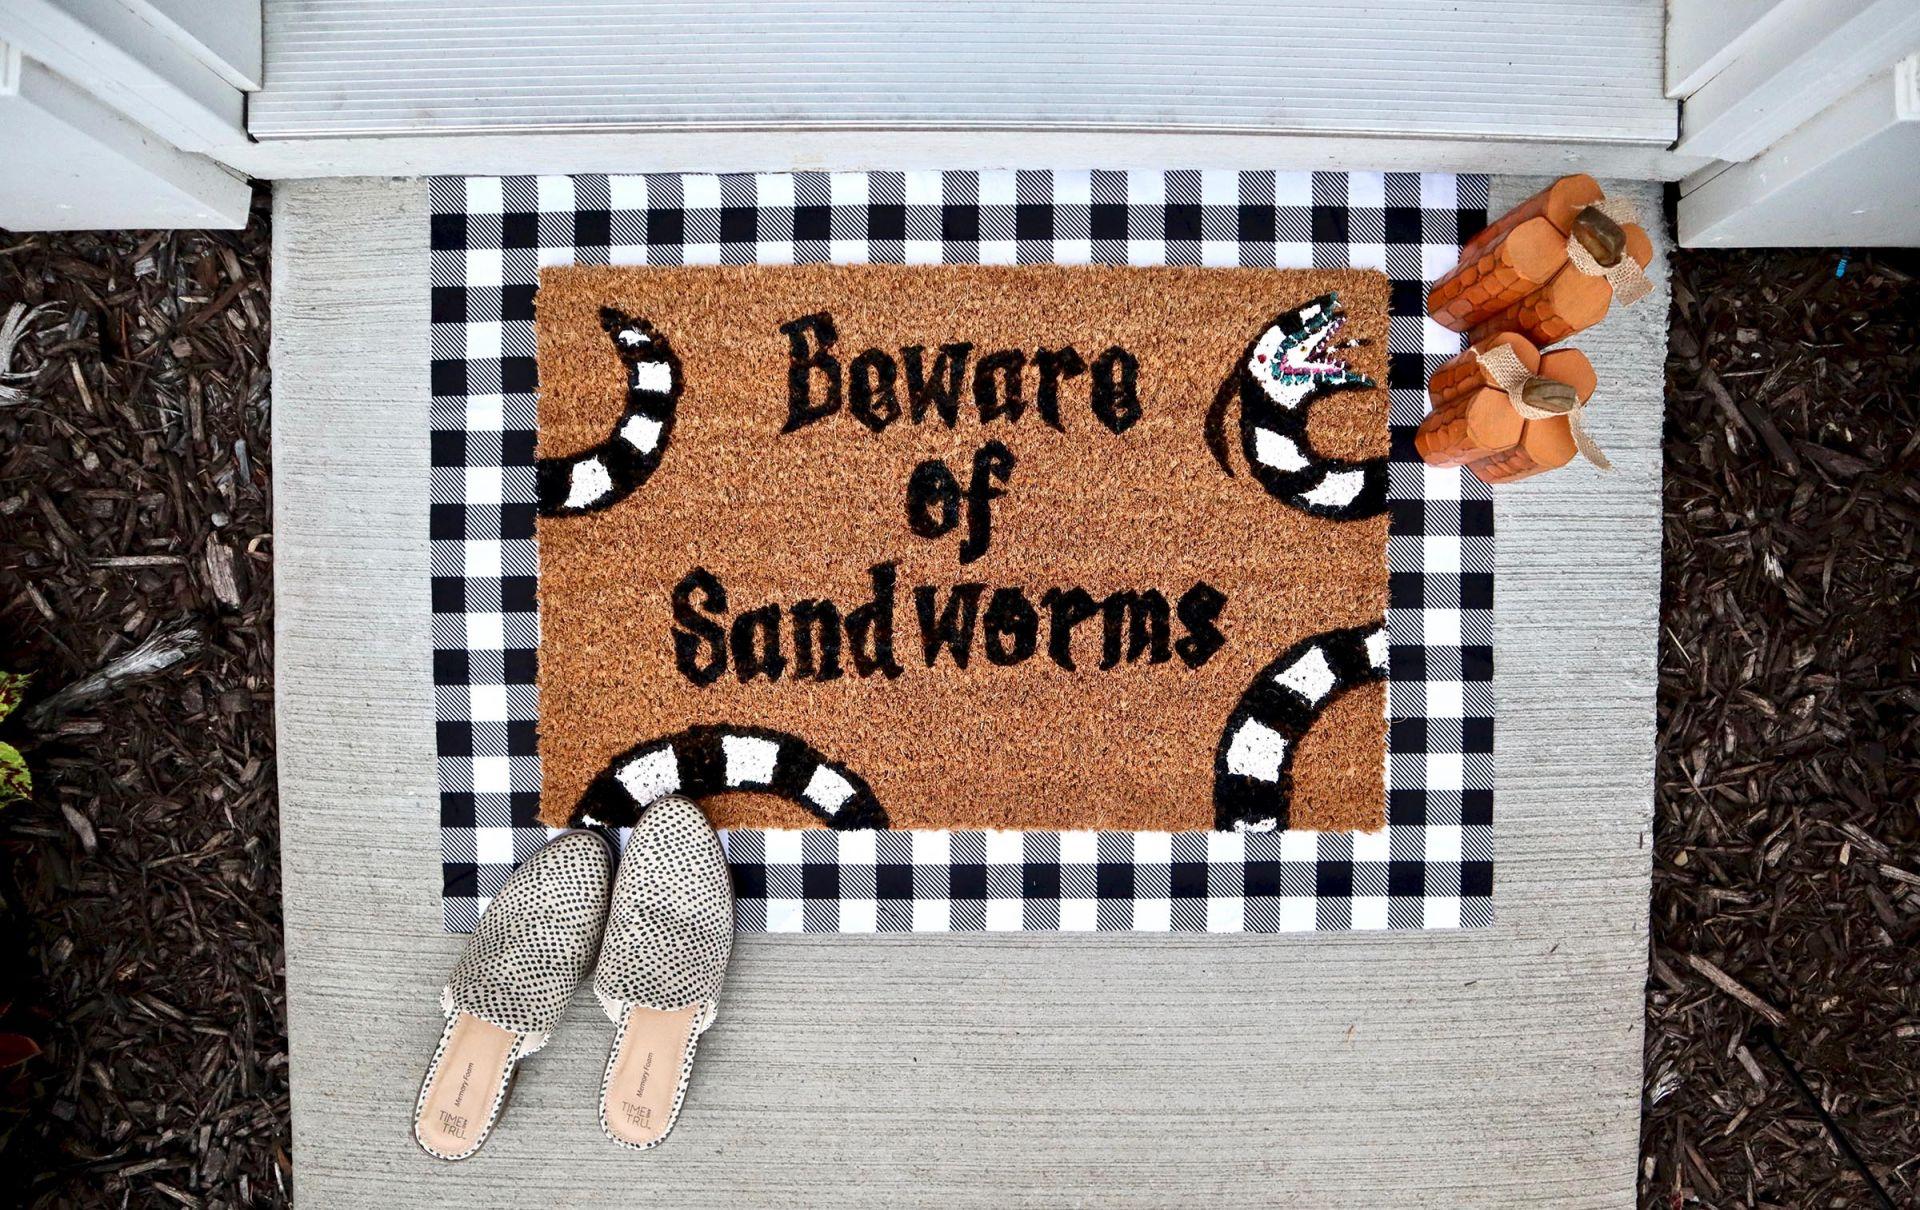 Beware of Sandworms' Welcome Mat – Beetlejuice Home Decor ...